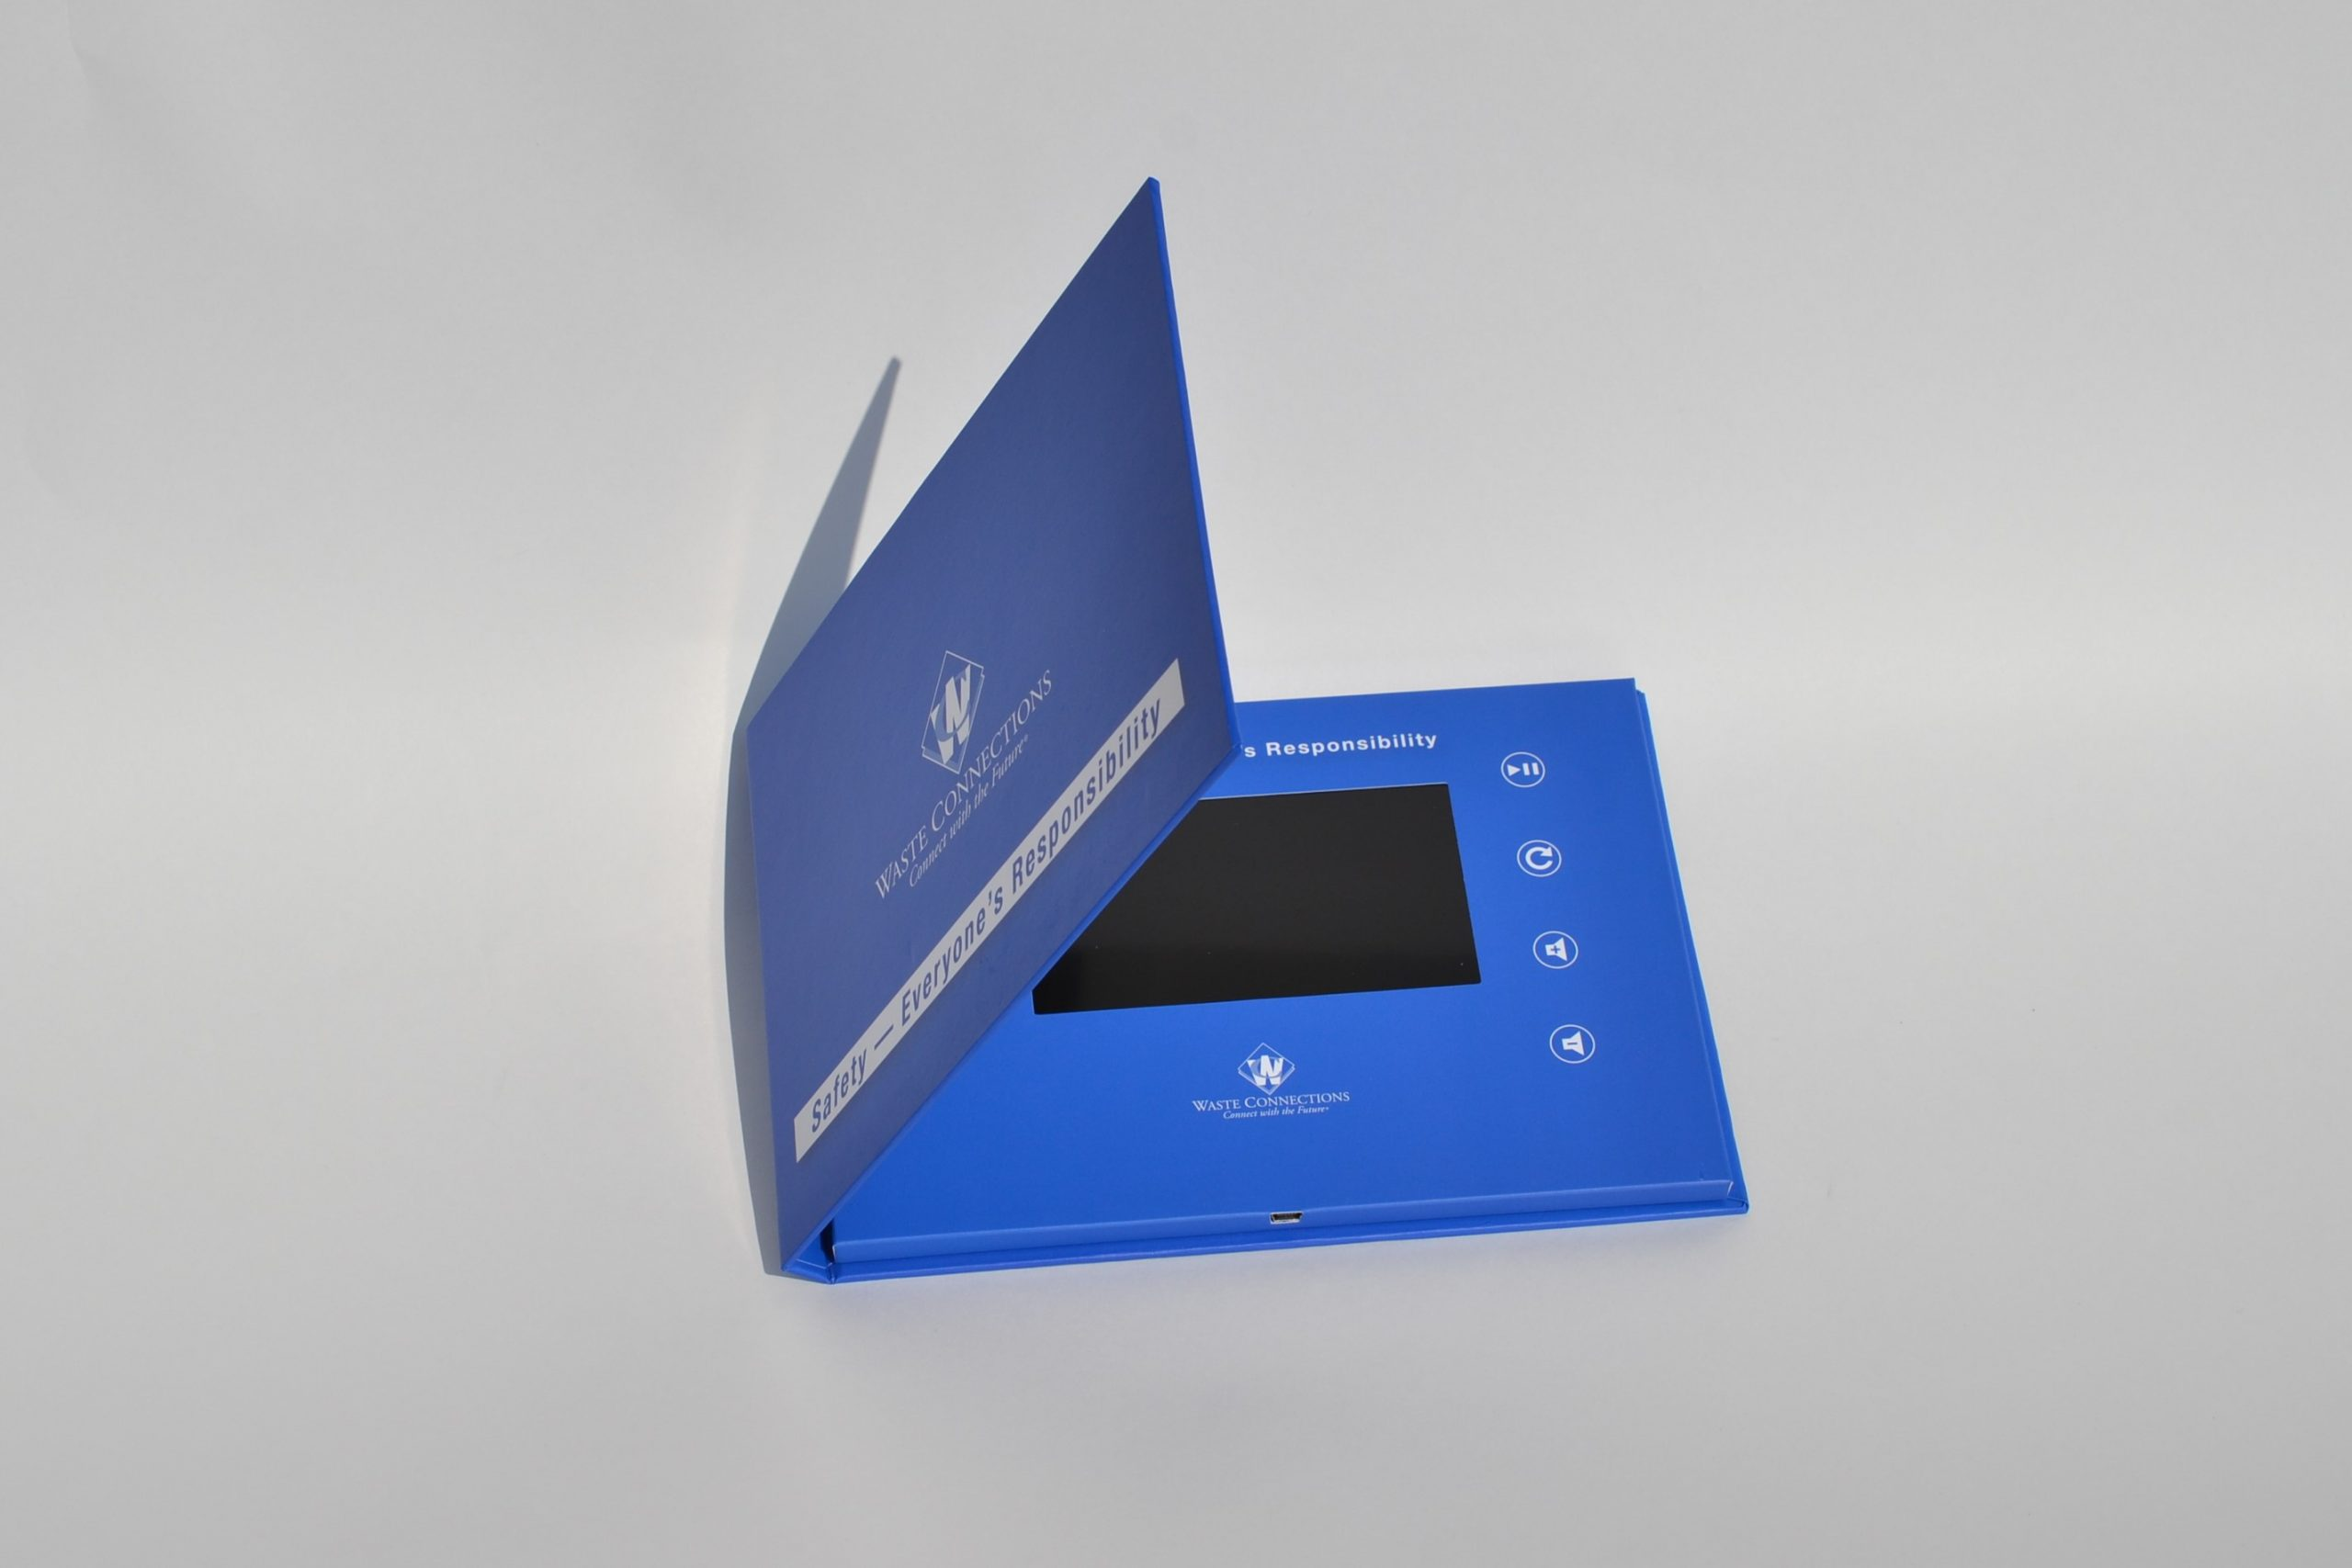 5-inch video brochure hardcover open view